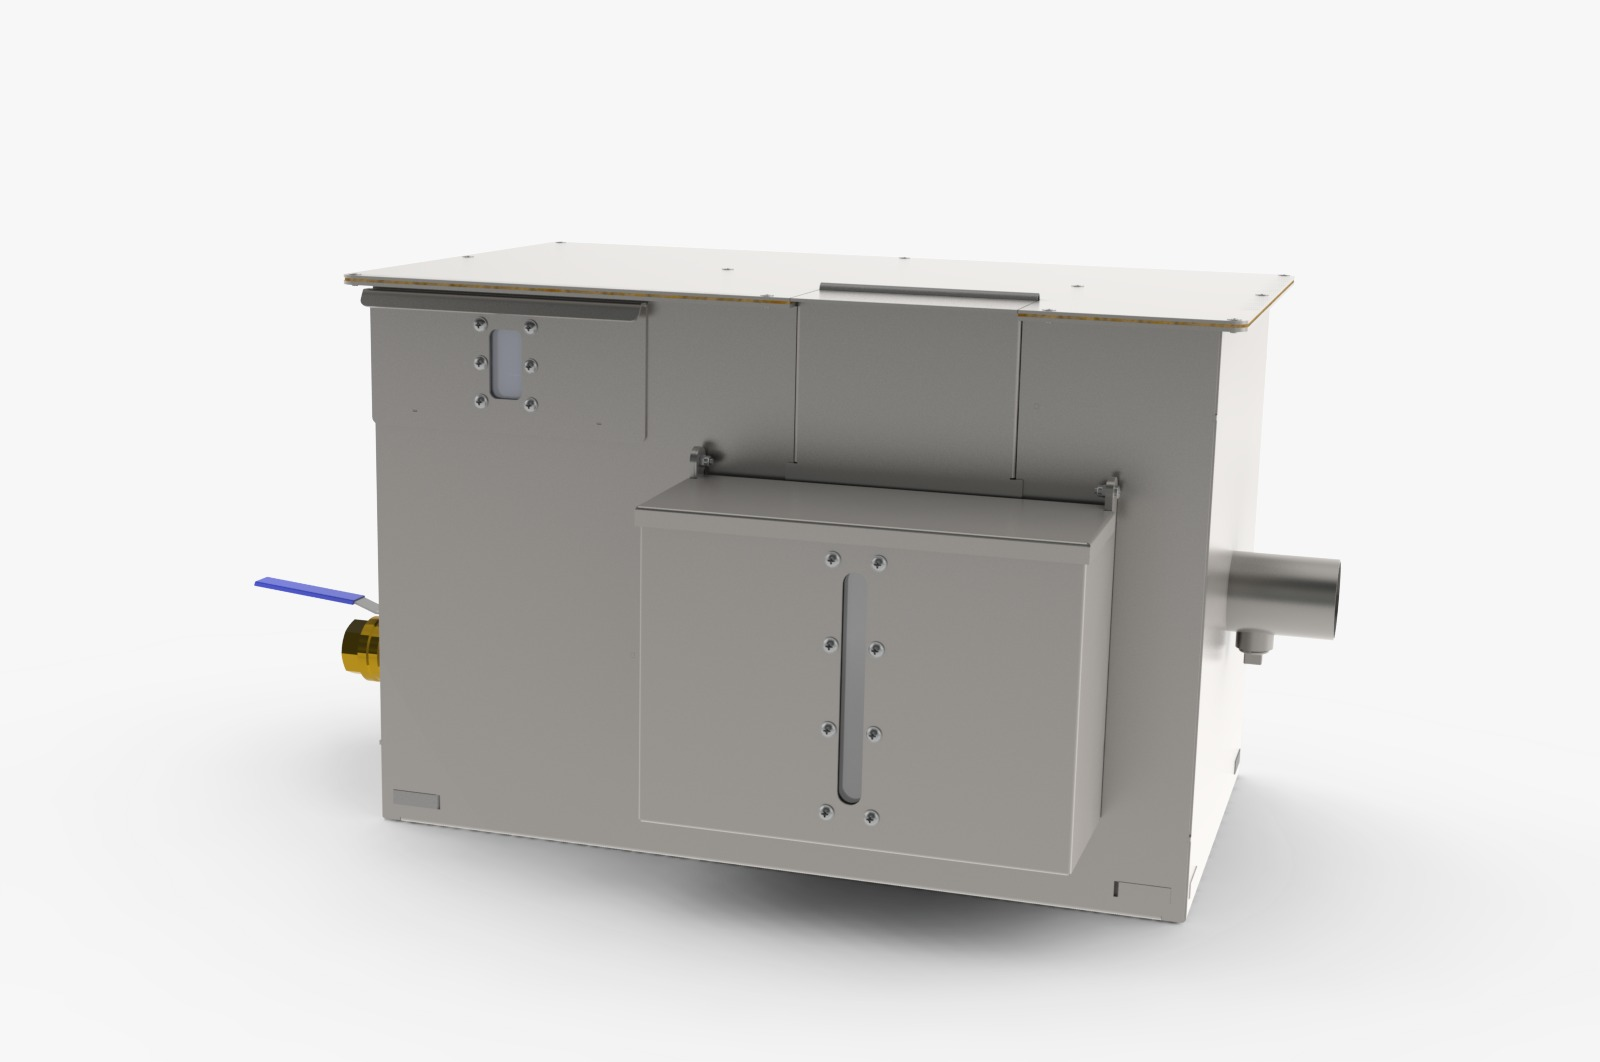 HC1 Grease removal unit - Fog Fellow Designs LTD